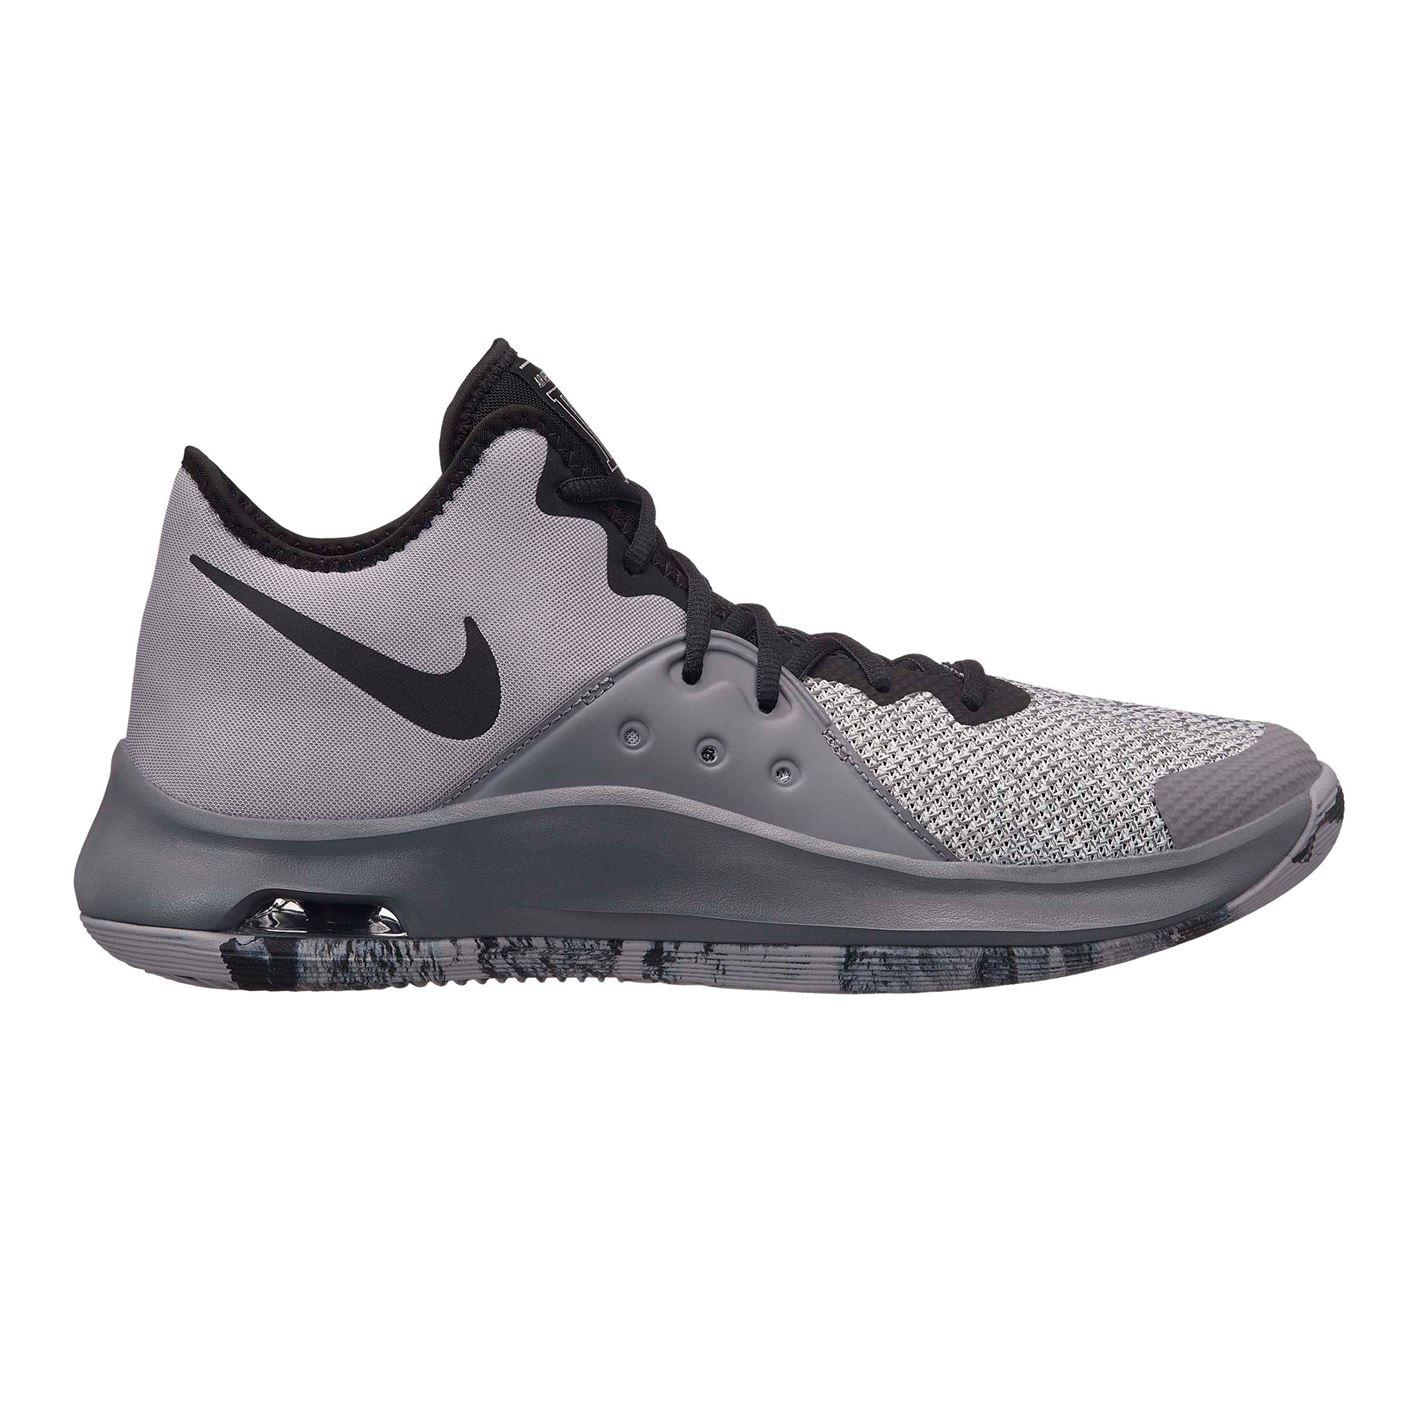 1145f8dcfef3b Tenisky Nike Air Versitile 3 Mens Baskteball Trainers - Glami.cz